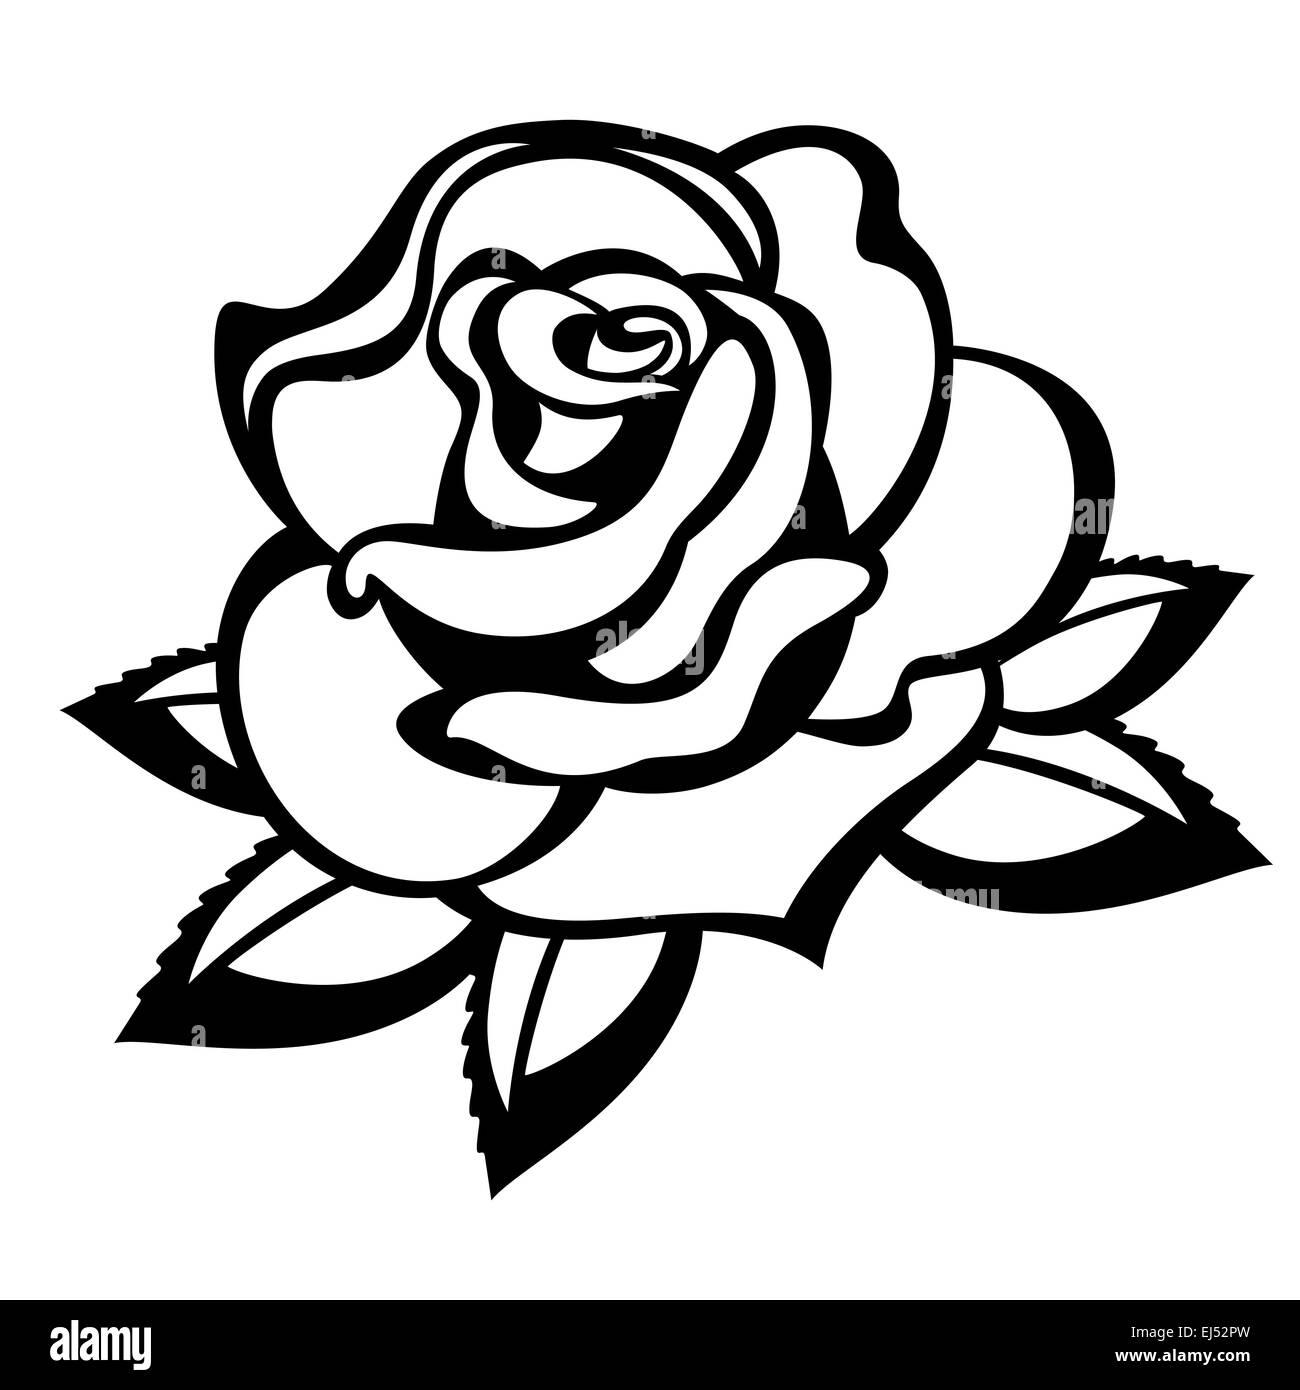 single flower rose bud silhouette stockfotos single flower rose bud silhouette bilder alamy. Black Bedroom Furniture Sets. Home Design Ideas